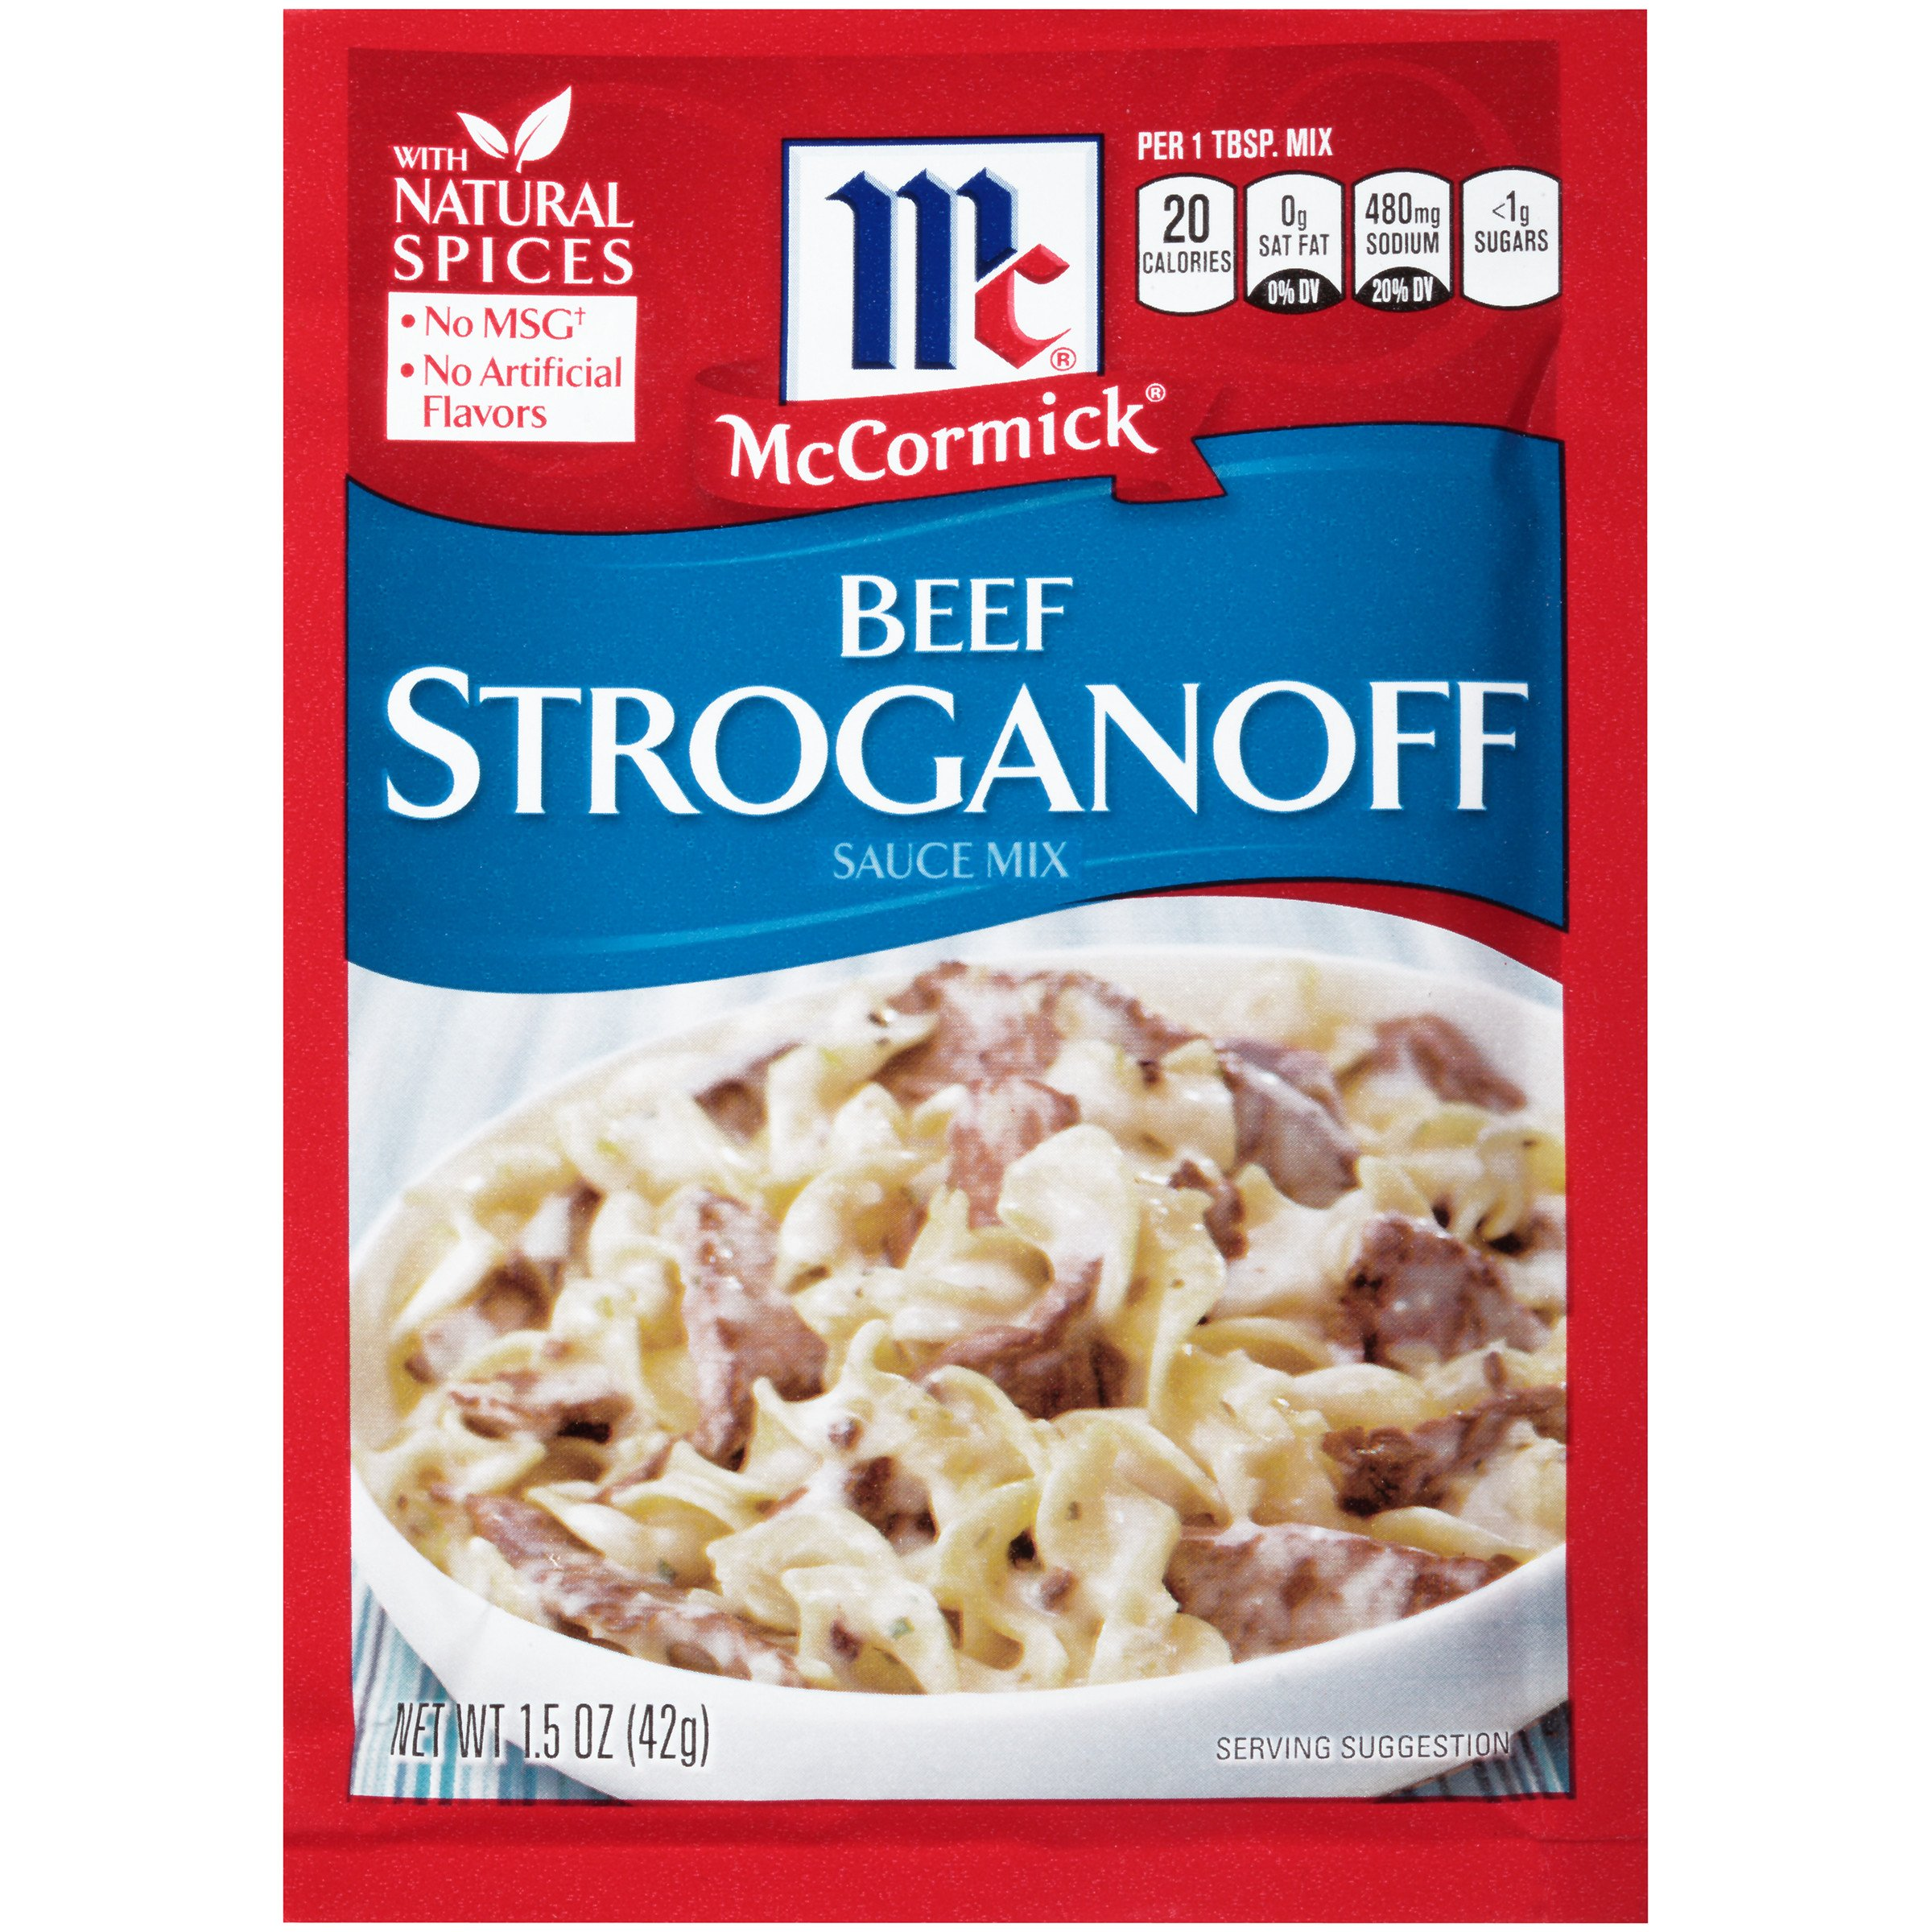 McCormick Beef Stroganoff Seasoning Mix, 1.5 oz